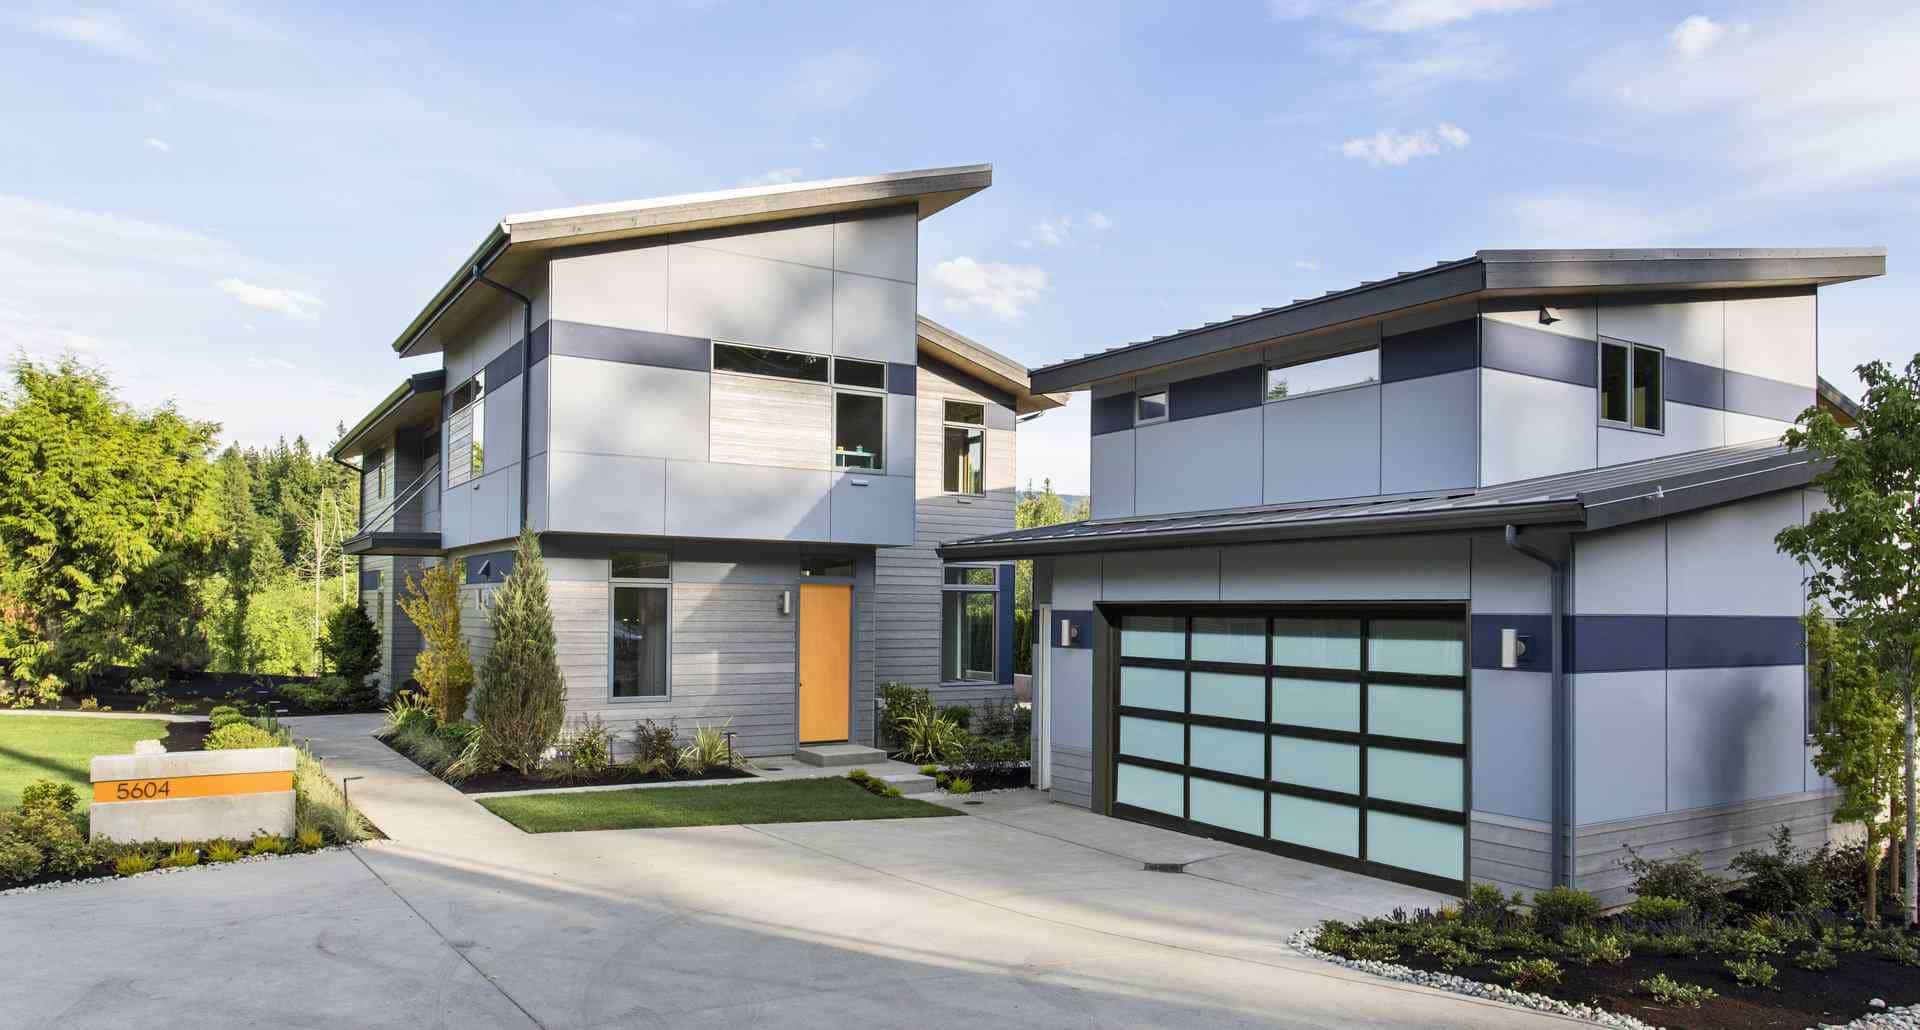 Real Estate Agent Issaquah